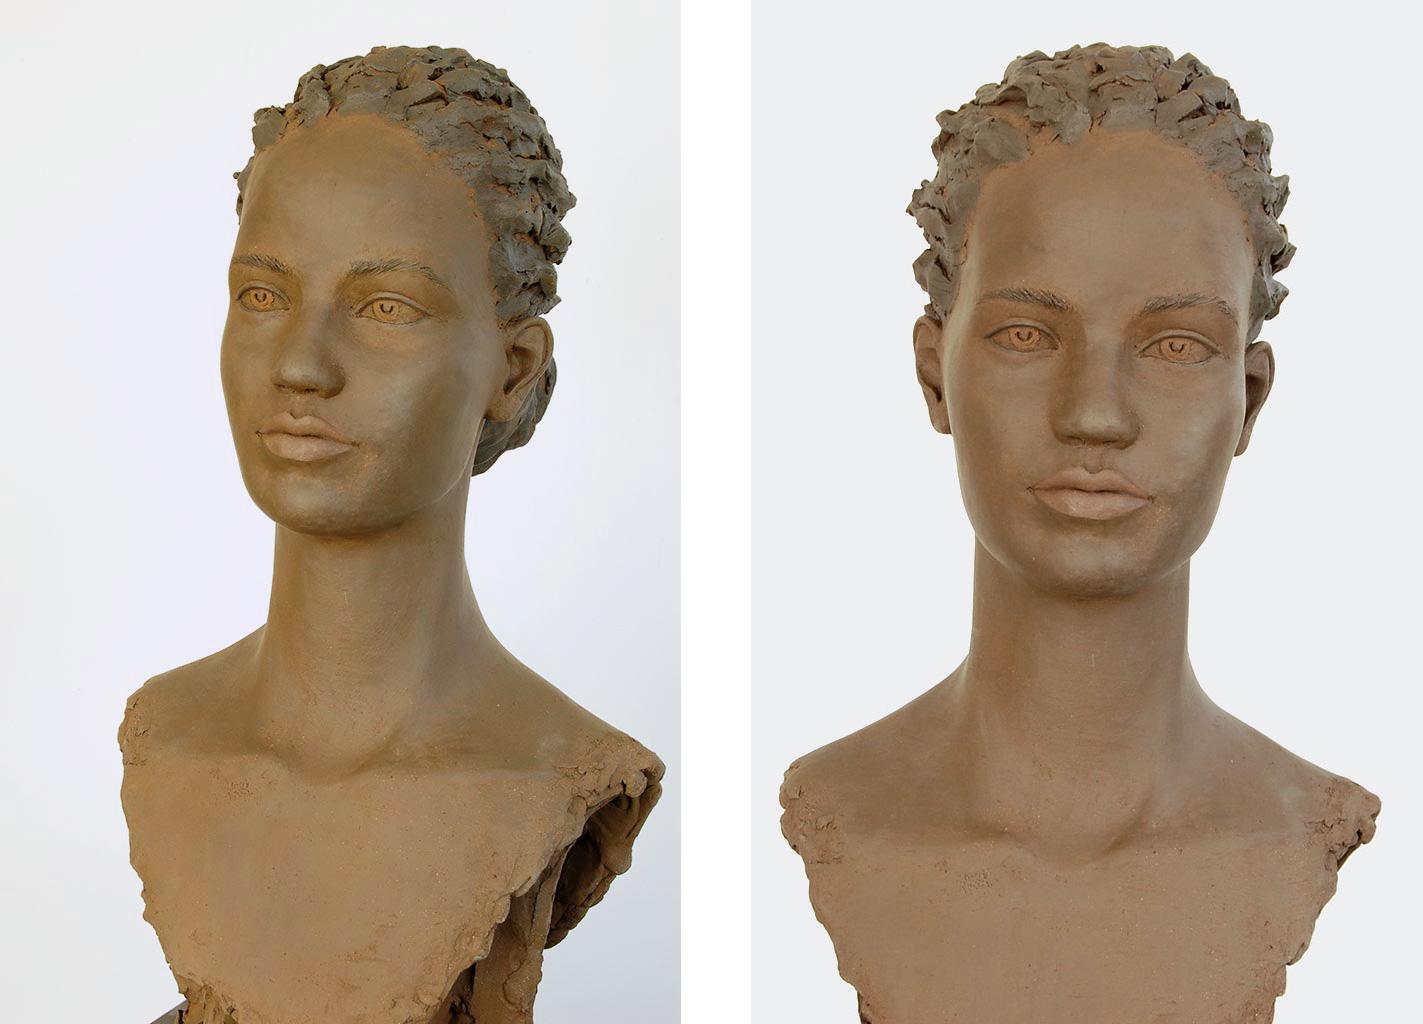 Nunguja, Terrakotta engobiert, 49x26x27 cm, 2020